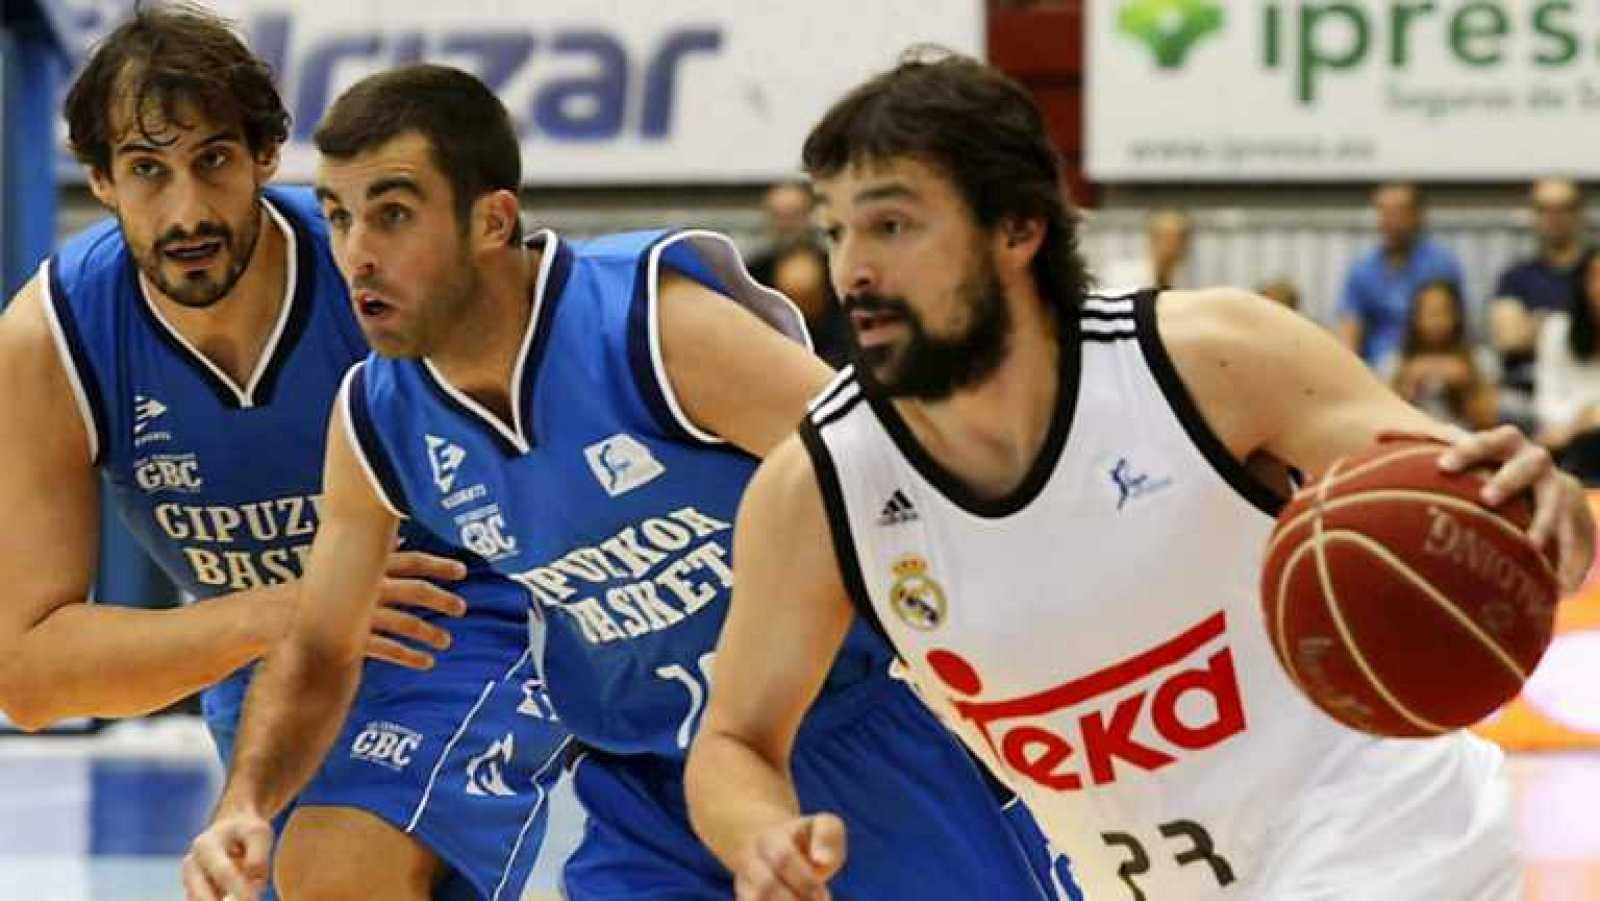 Baloncesto - Liga ACB. 2ª jornada. Gipuzkoa Basket - Real Madrid. Desde San Sebastián - ver ahora